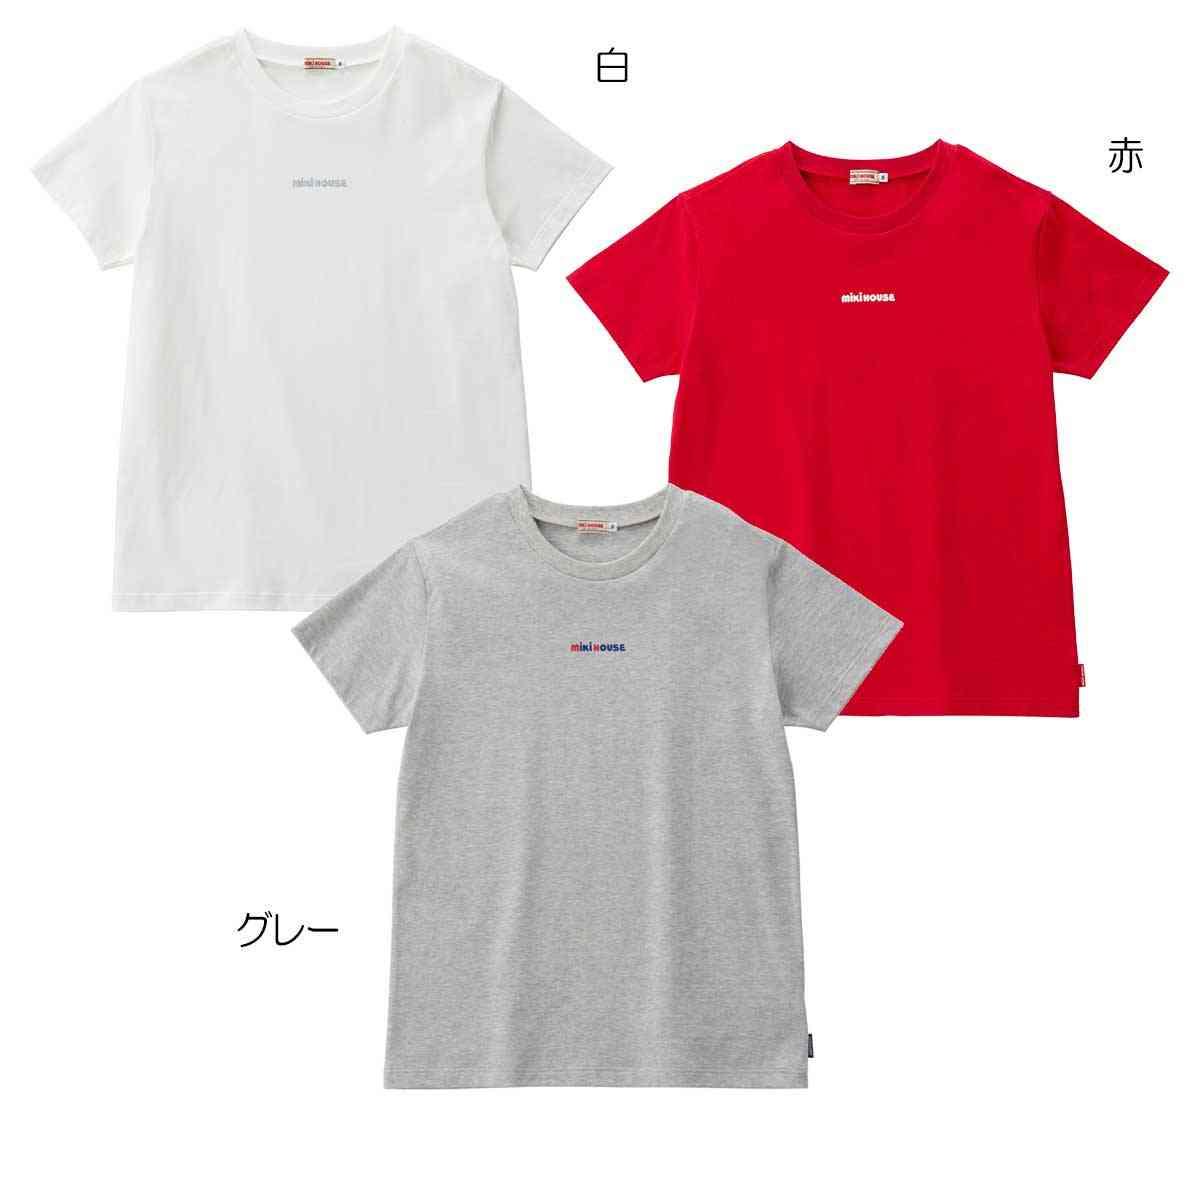 ☆ EveryDay mikiHOUSE(エブリデイミキハウス)ロゴプリント半袖Tシャツ 大人用 S-L 12-5271-268